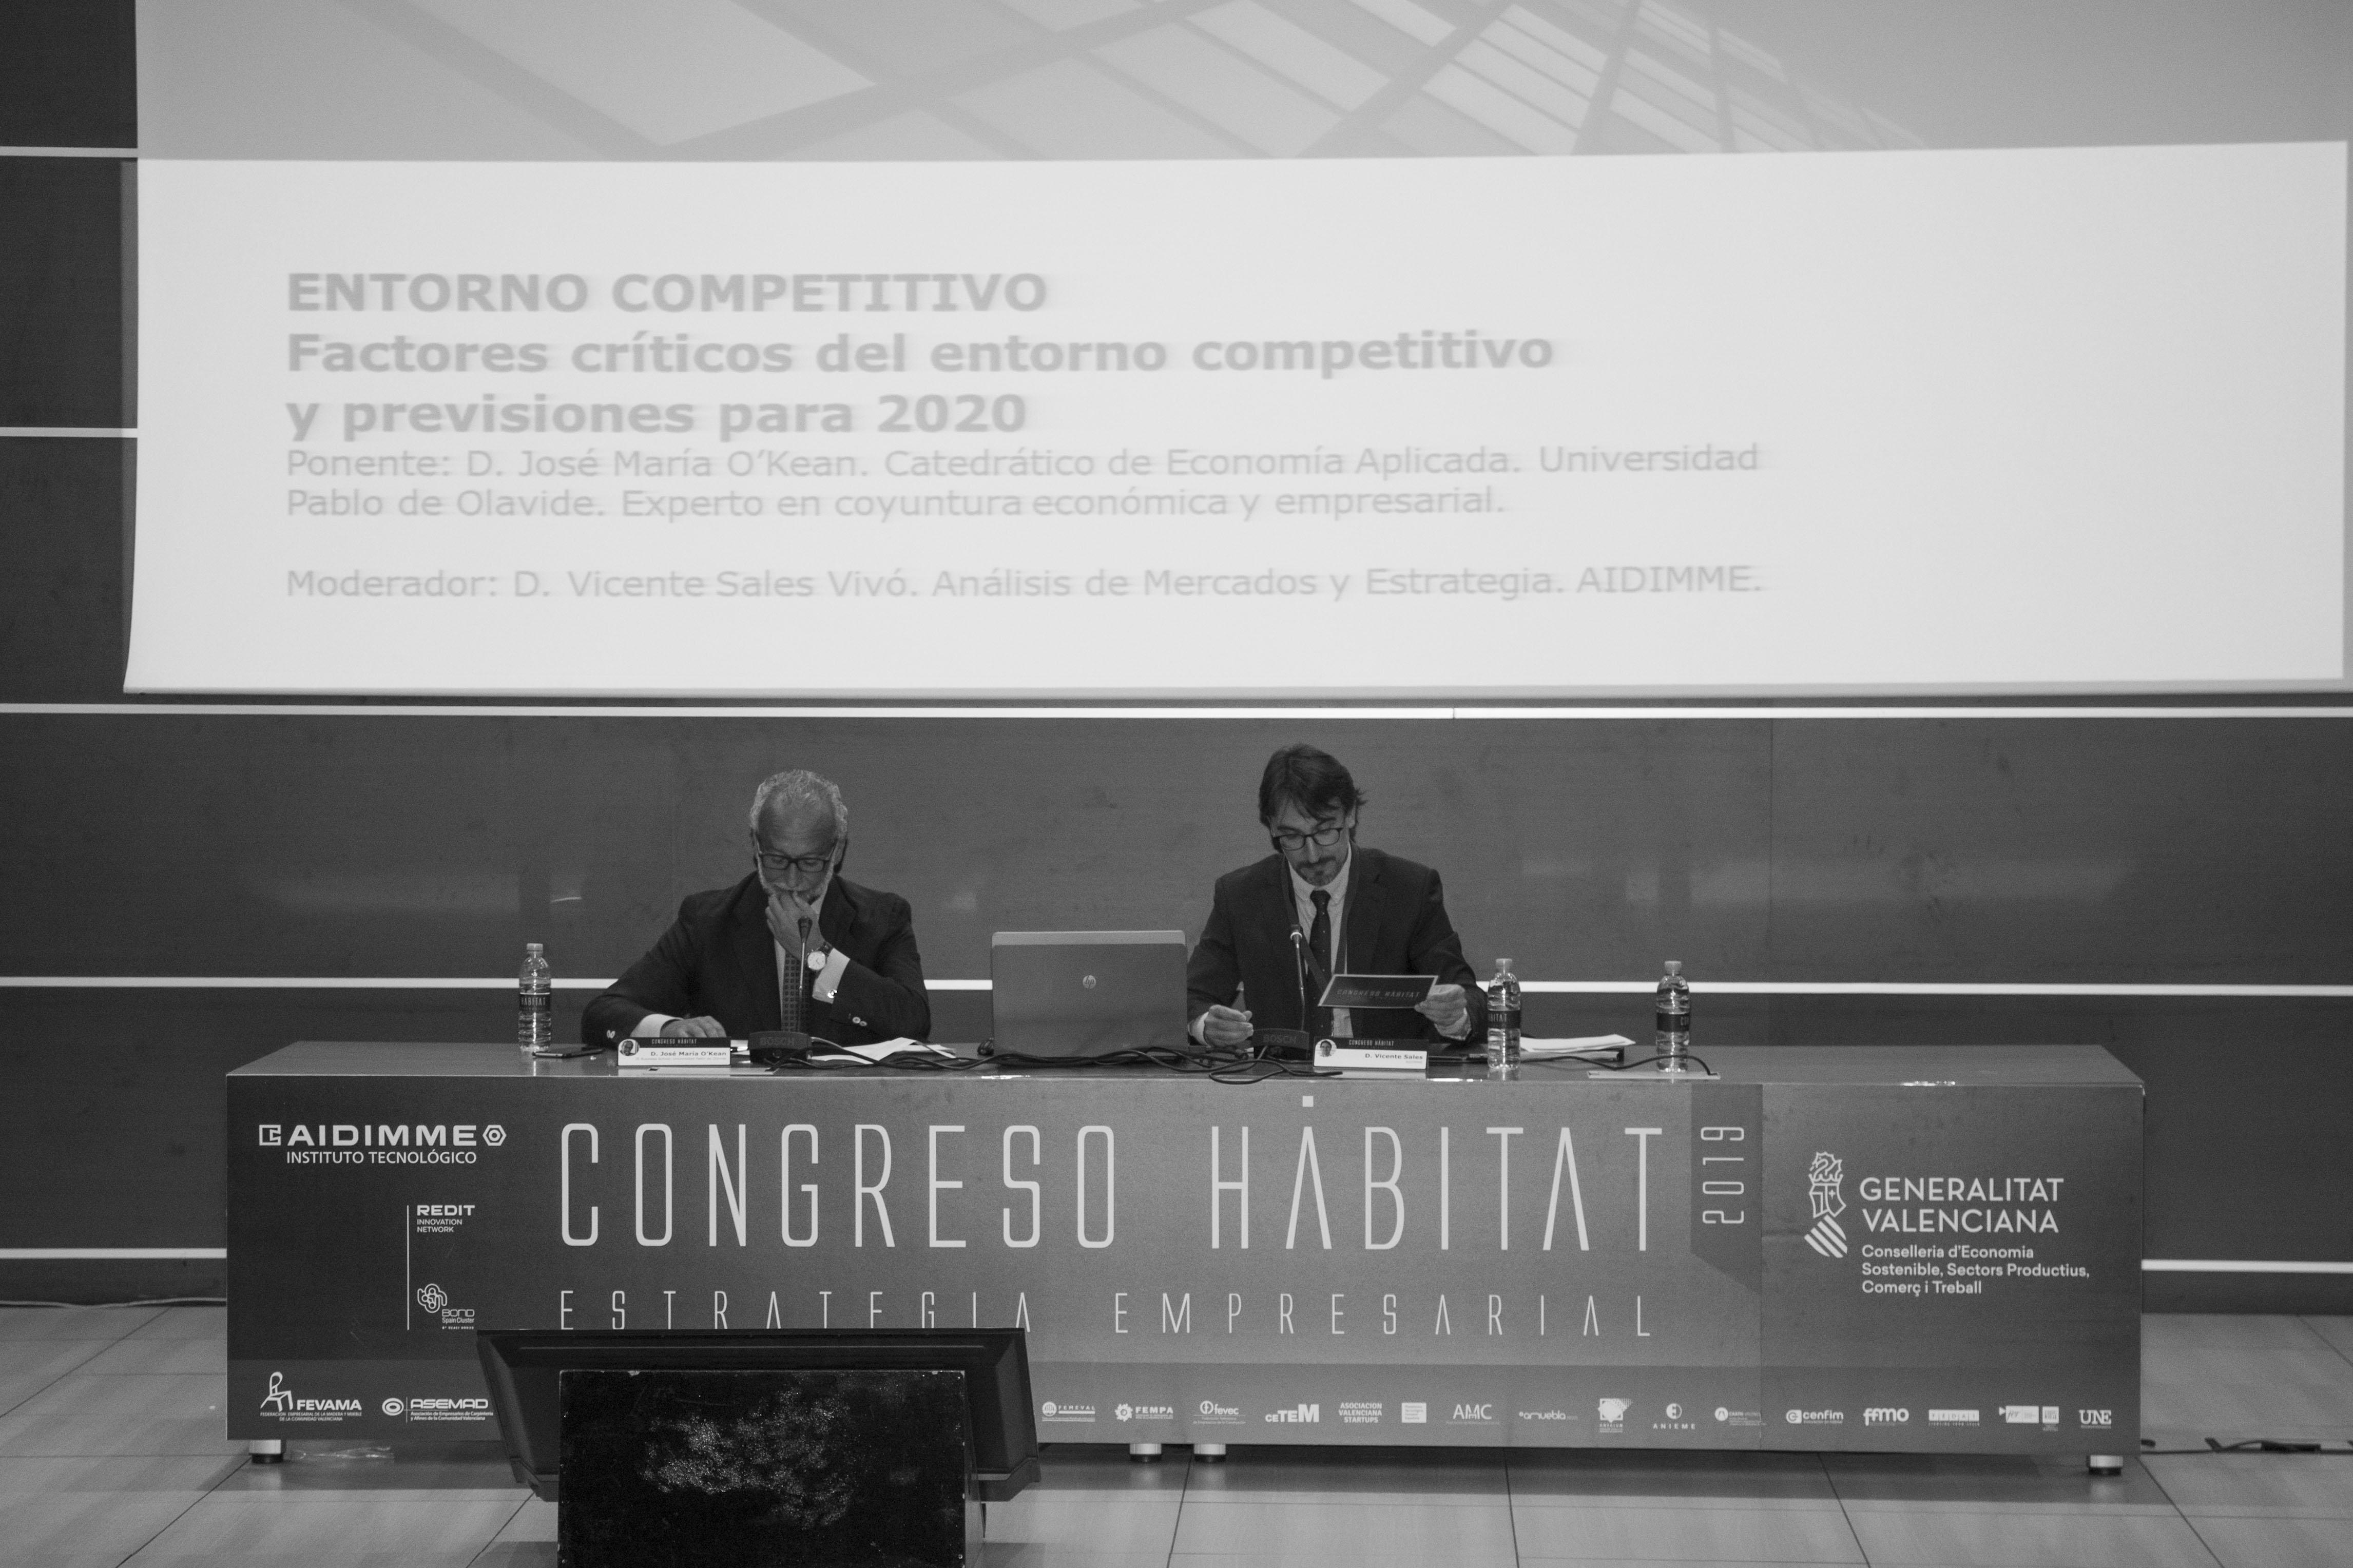 CONGRESO-HABITAT-196